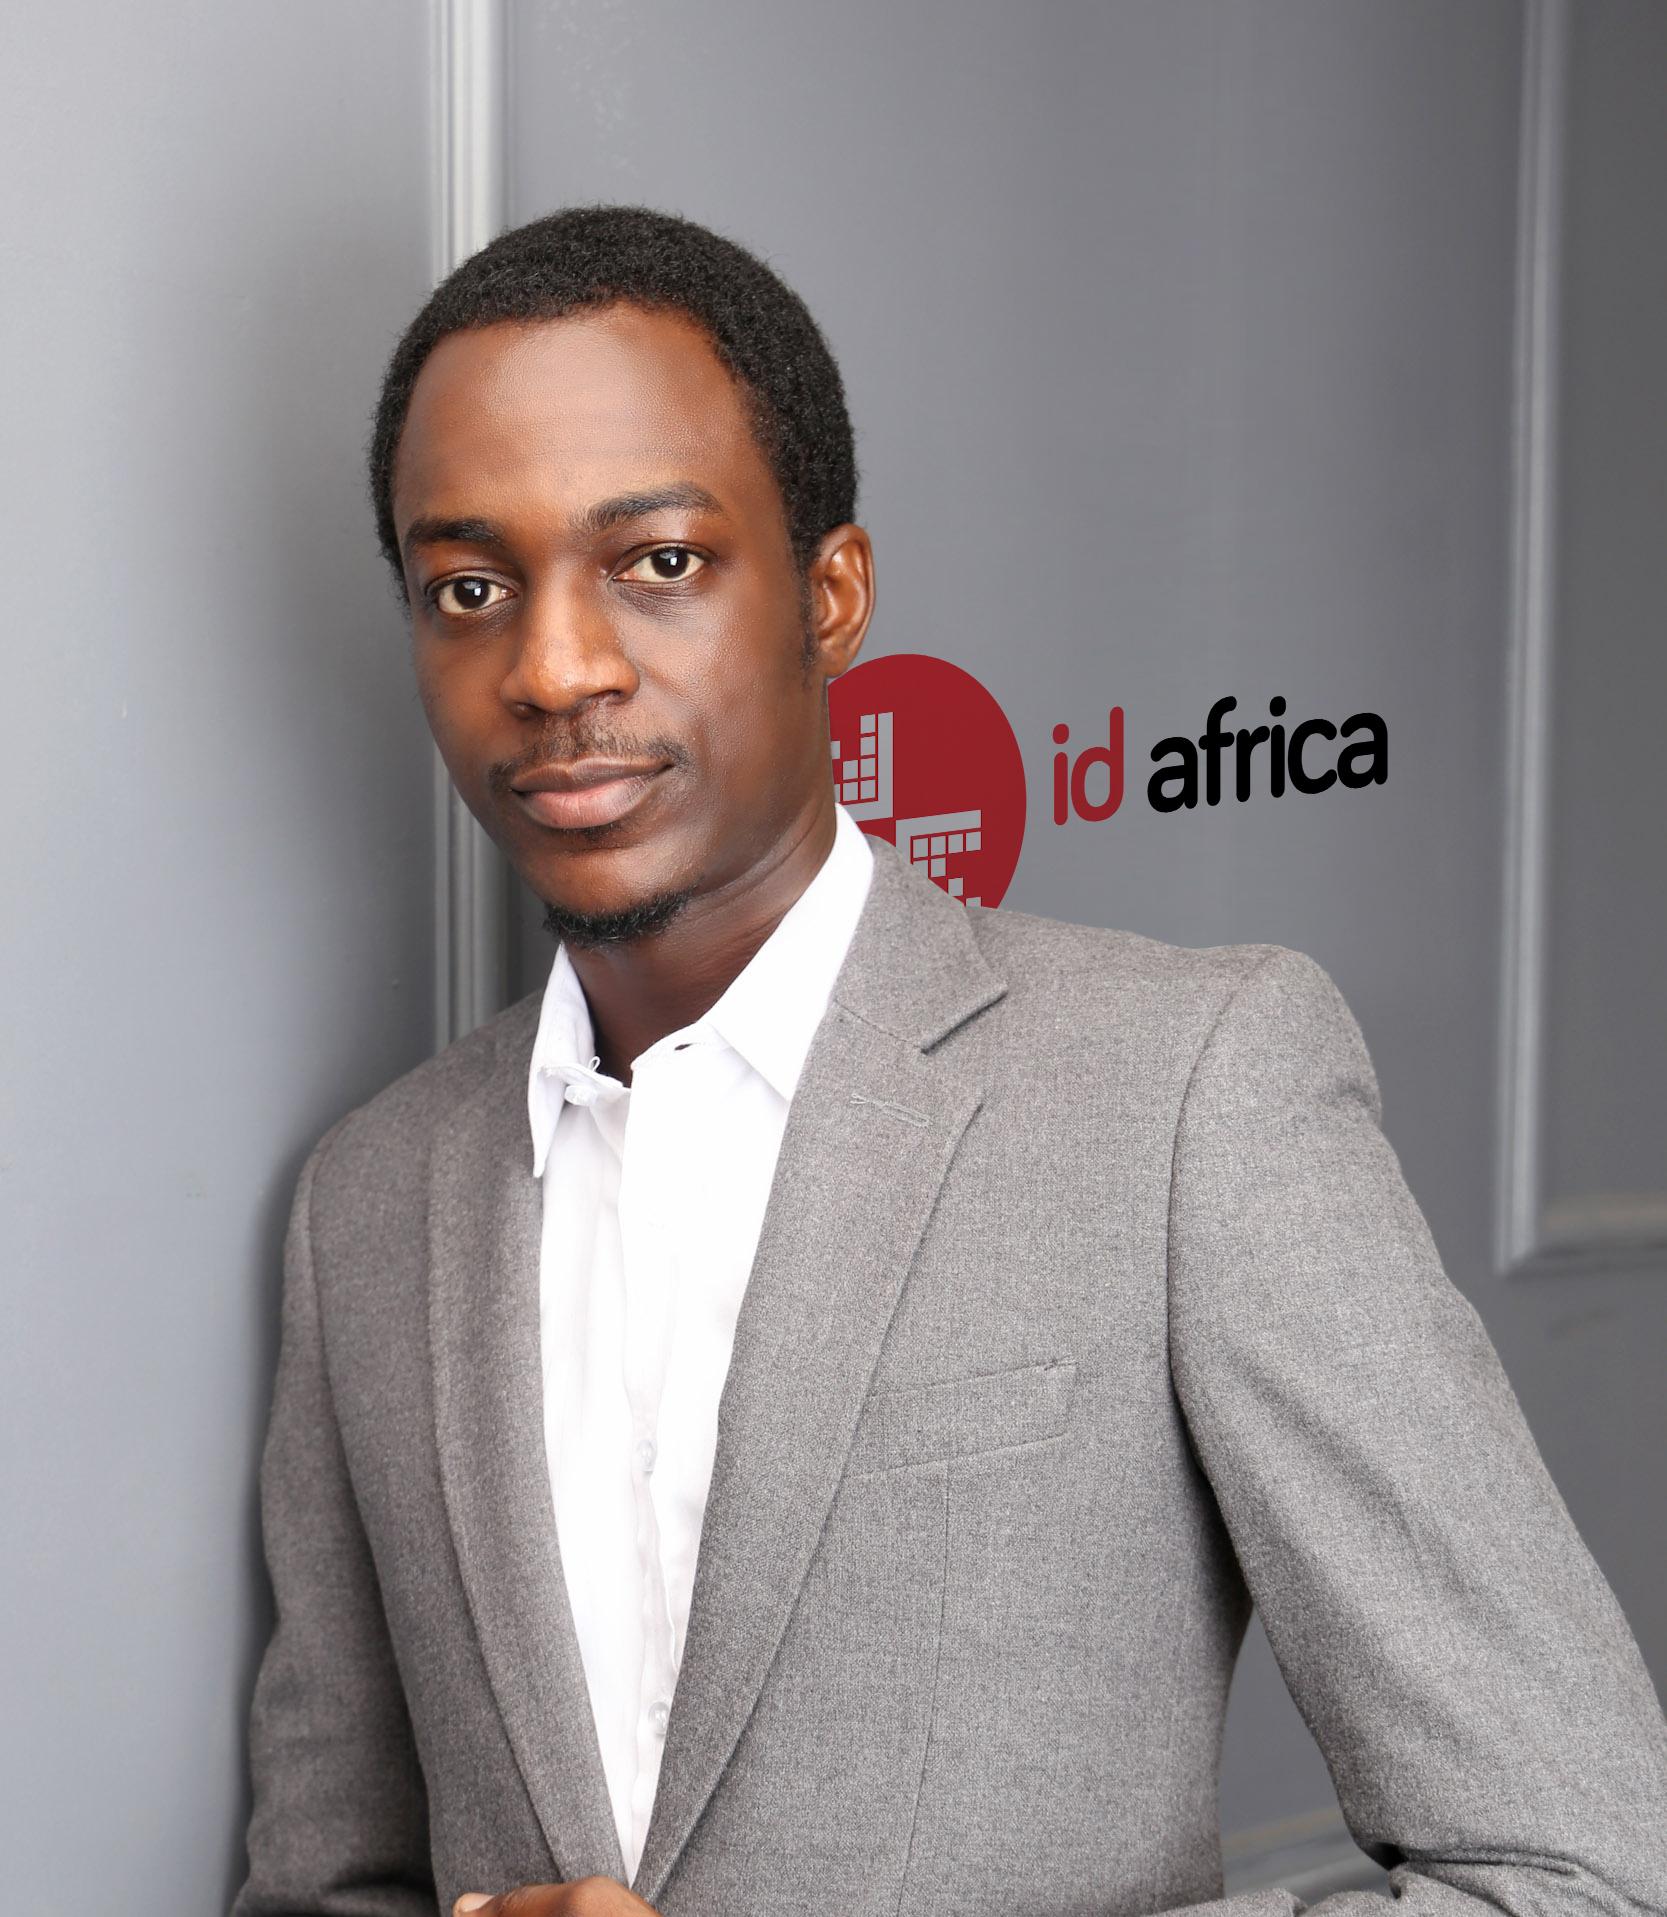 ID Africa Names Femi Falodun CEO